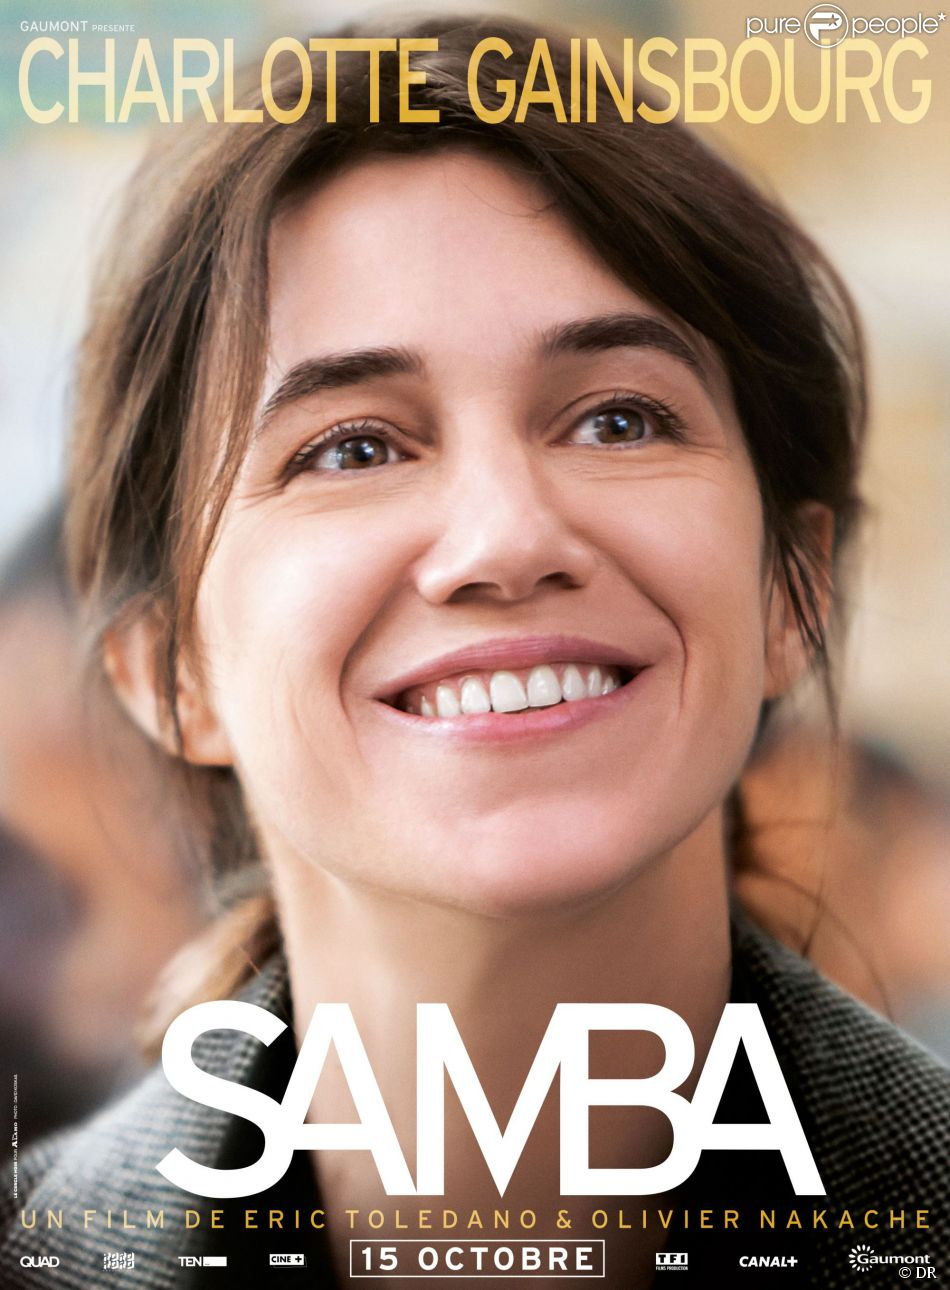 1548497-affiche-du-film-samba-d-eric-toledano-950x0-1.jpg